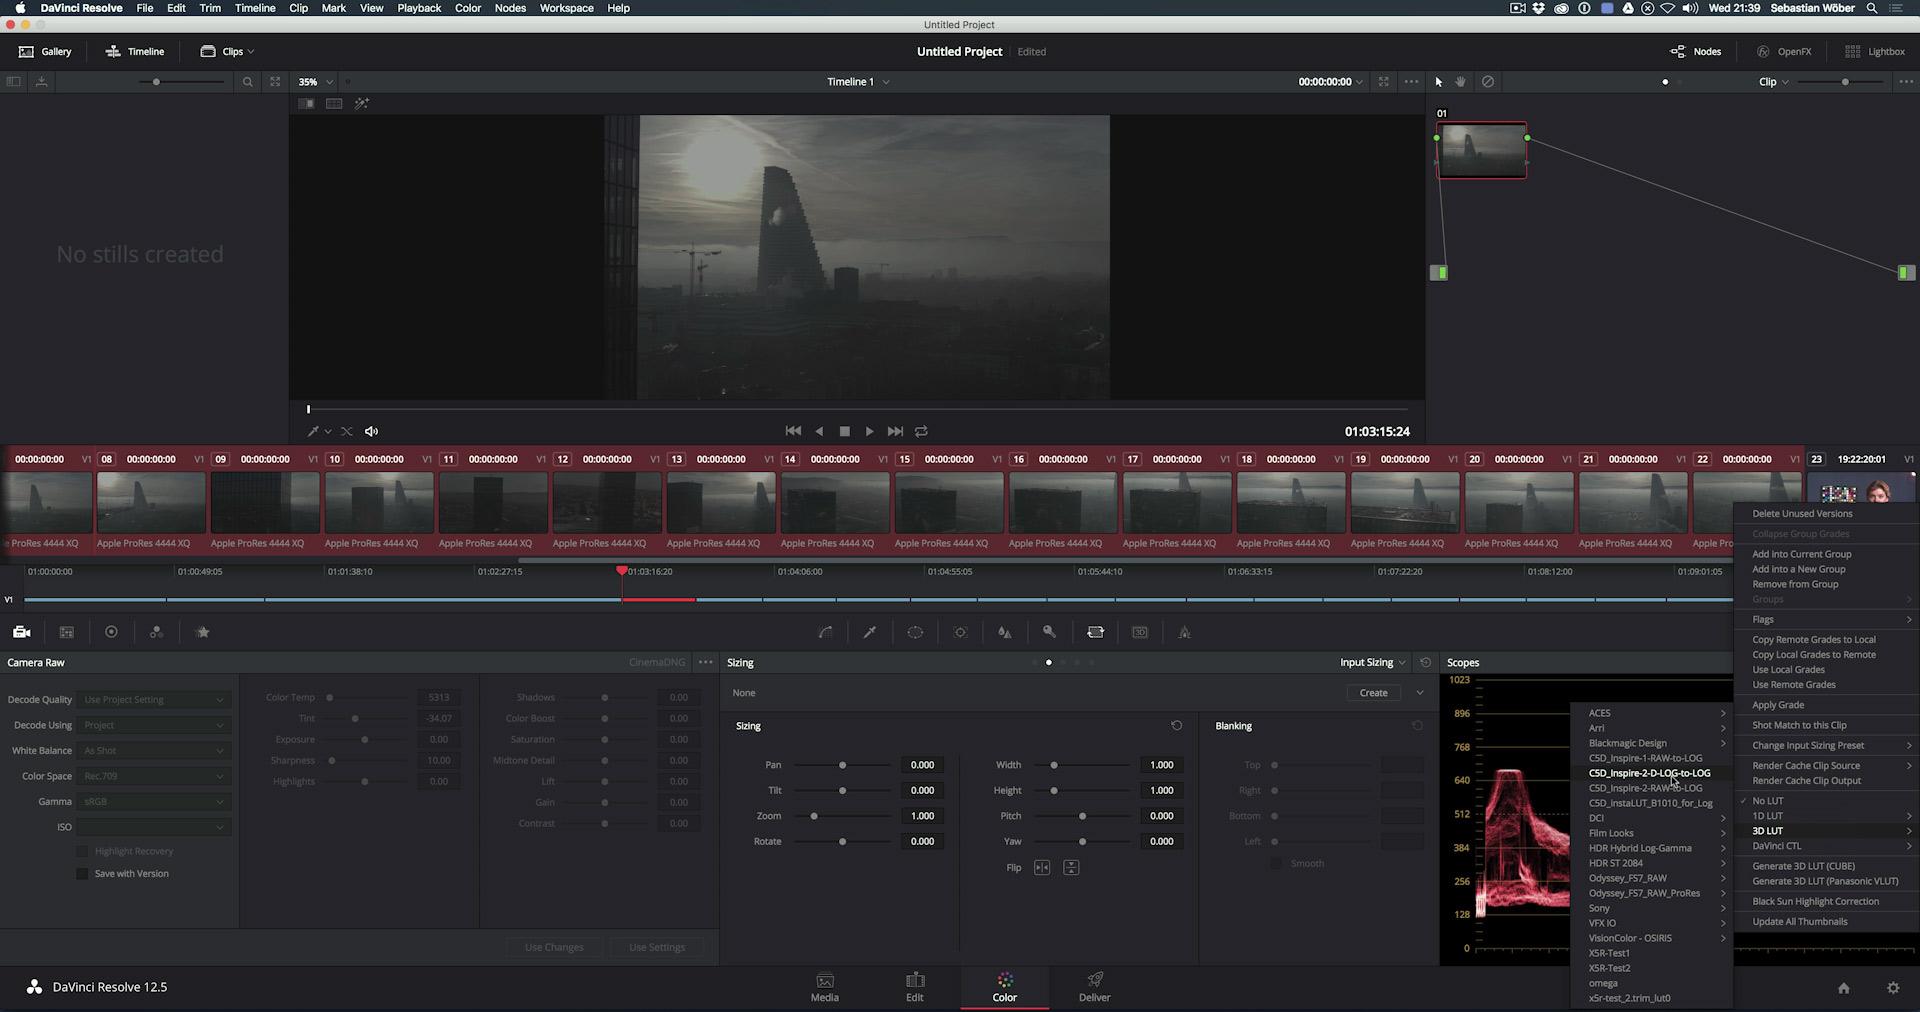 Convert Inspire 2 Raw Files & Grade D-Log - Mastering Drone